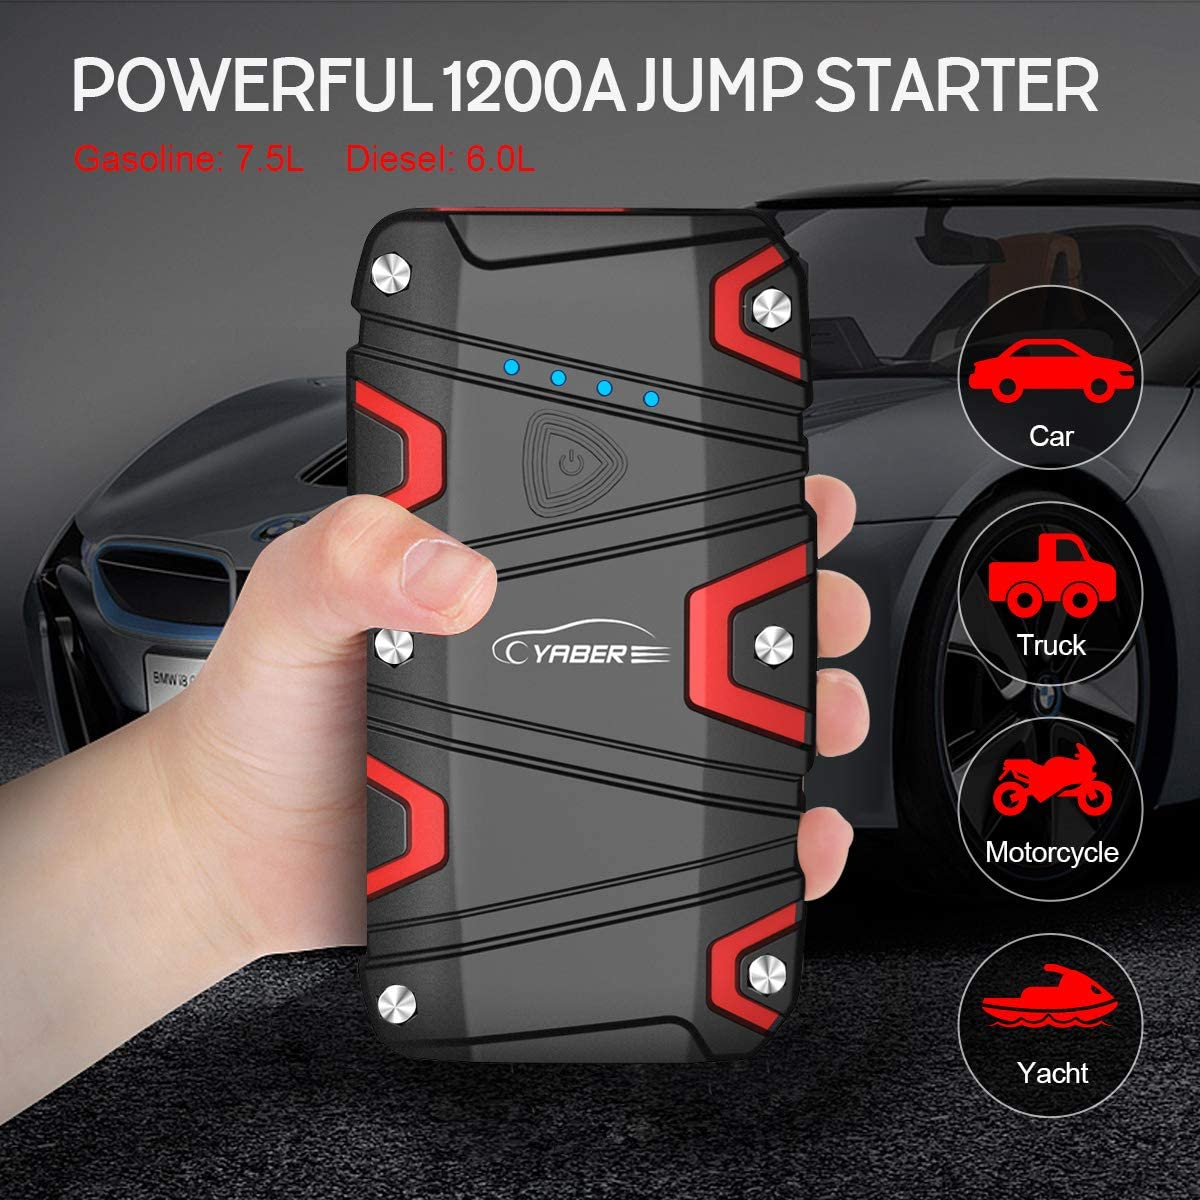 1200A 15000mAh Avviatore Batteria Auto YABER Avviatore Emergenza per Auto Torcia LED Portatile Starter Batteria Auto Impermeabile IP68 Power Bank con QC 3.0 Fino a 7,5L a Benzina o Diesel da 6L